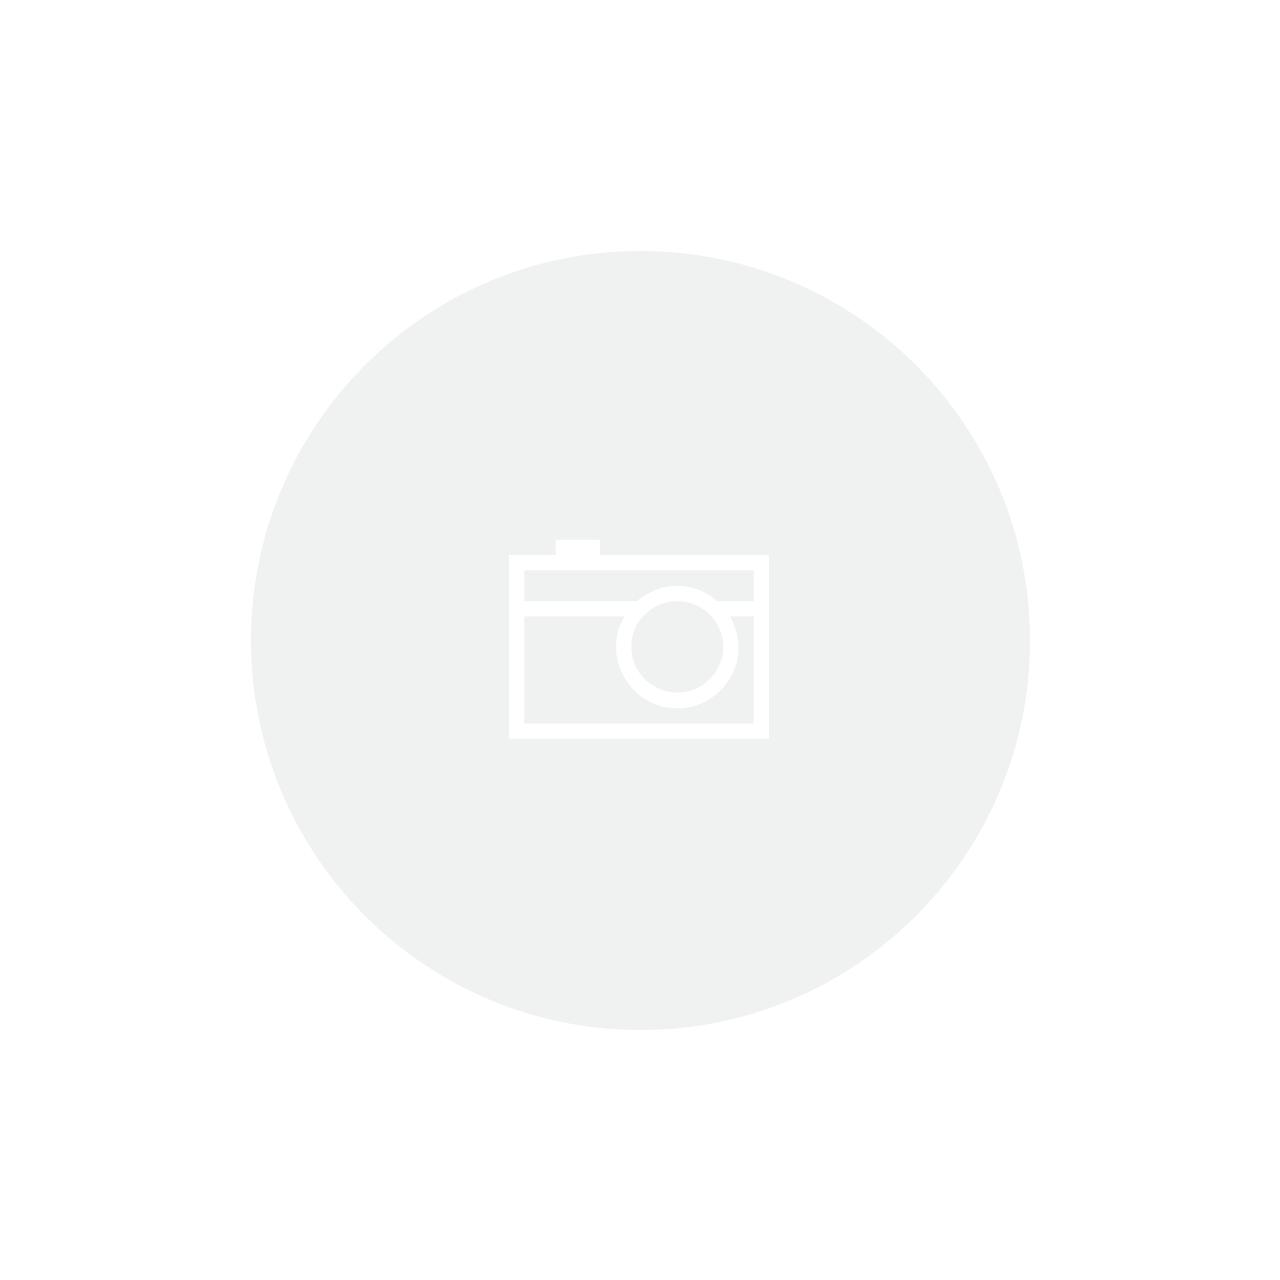 Grelha de Aço Inox com Abertura Lateral 422x270mm Tramontina